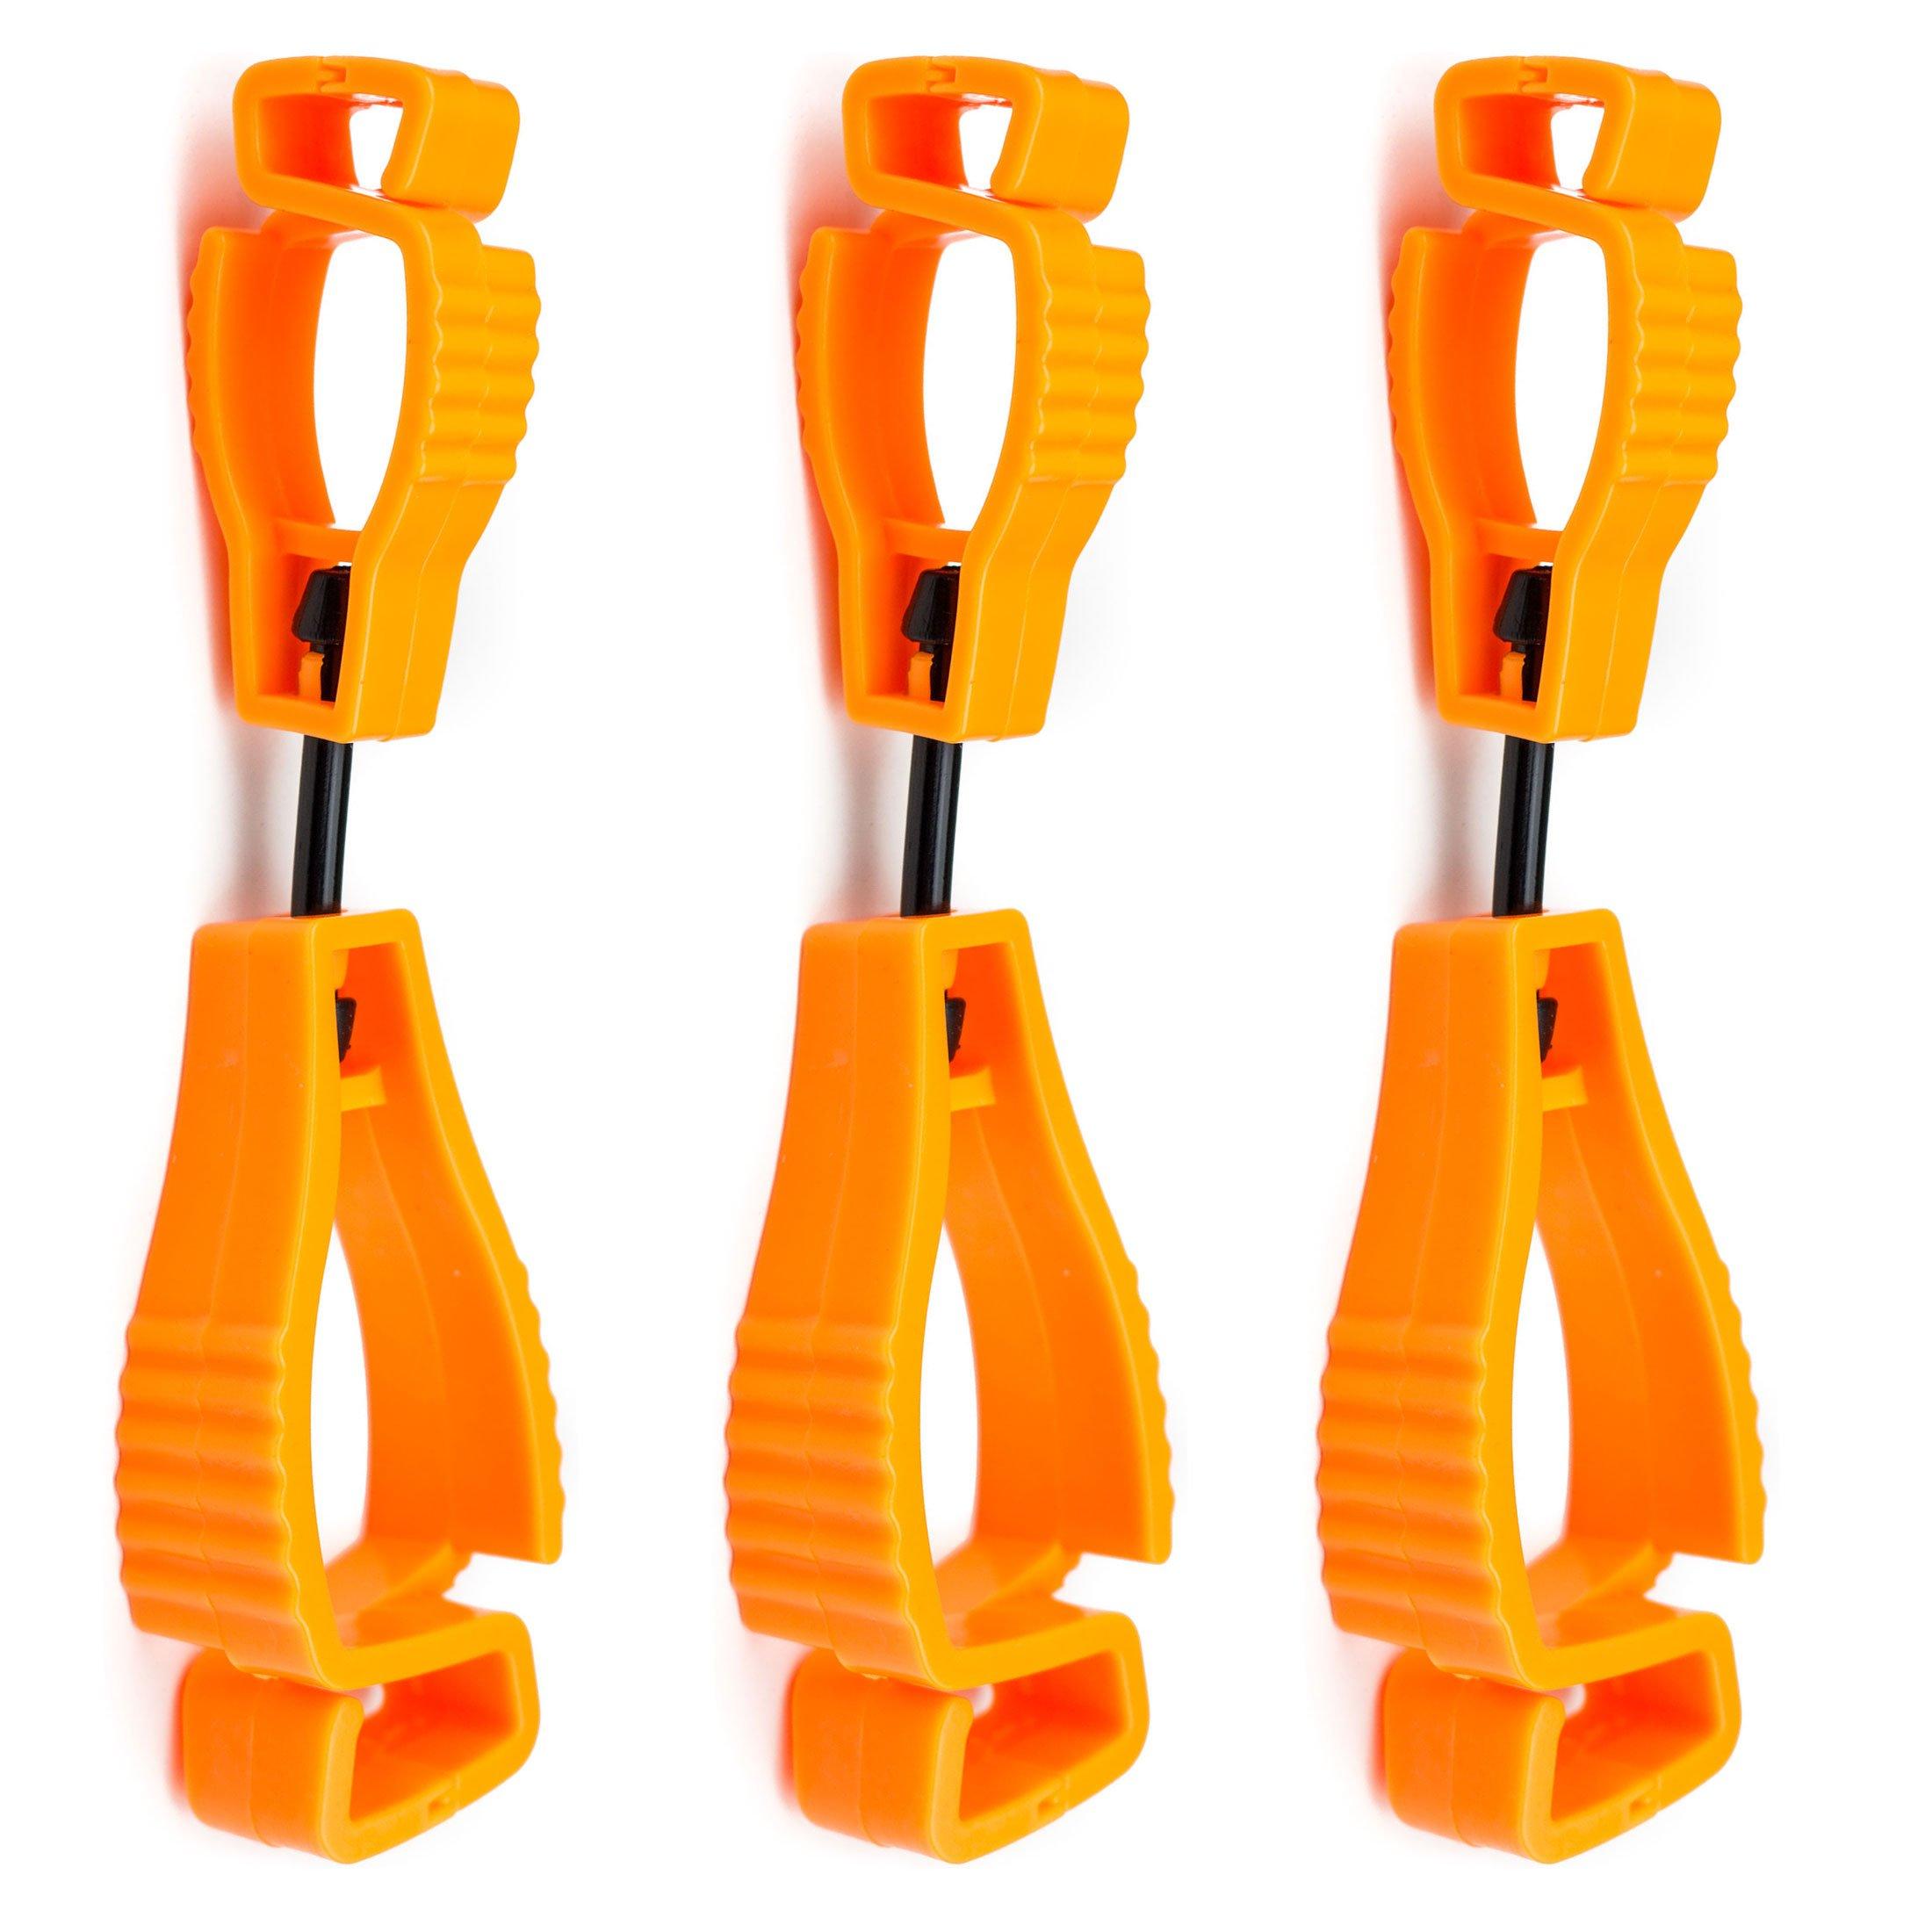 Better Grip RKGC Breakaway Glove Grabber, Glove Clip, 5-Inch Long